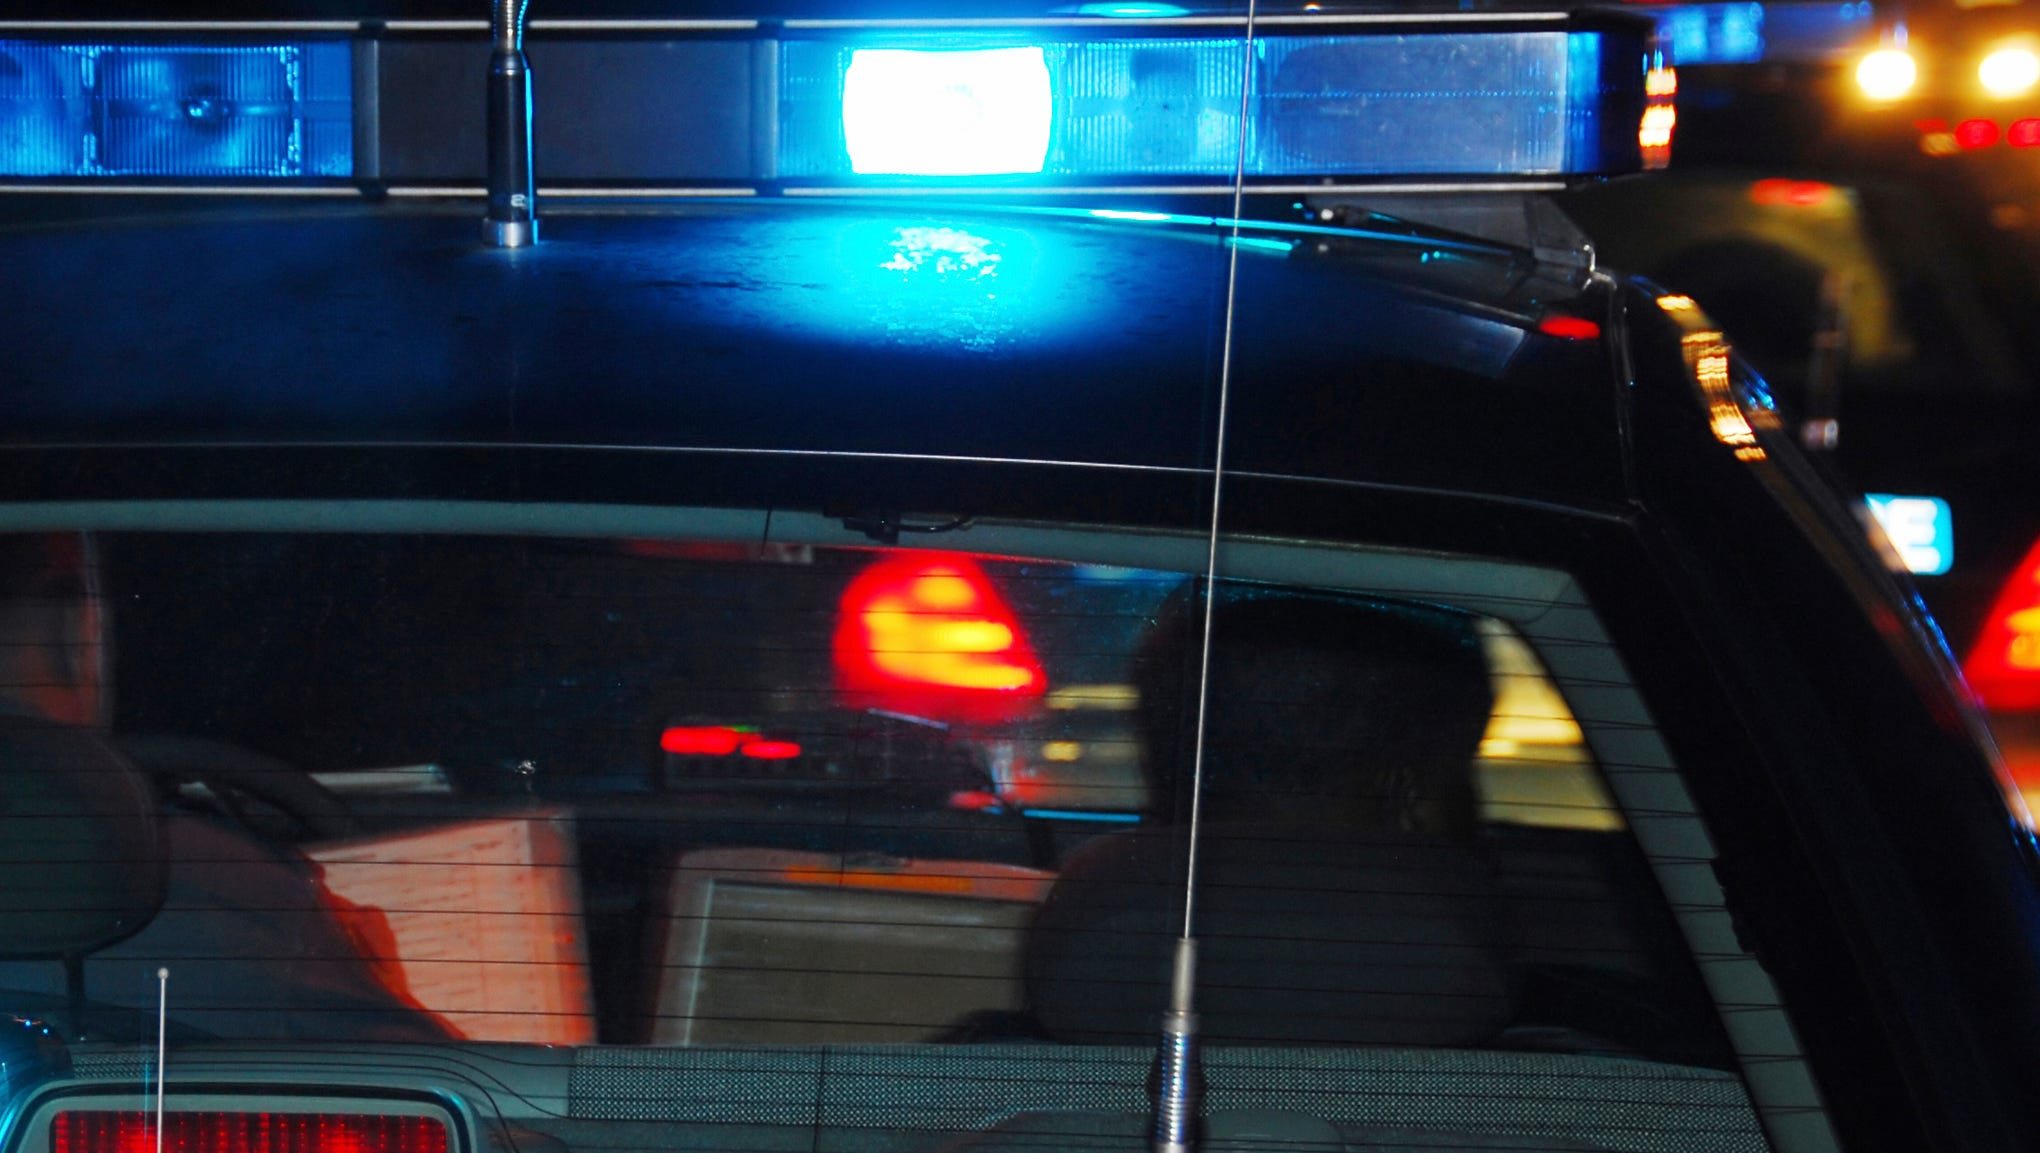 Man allegedly steals vehicle at Aztec Safeway with child left inside